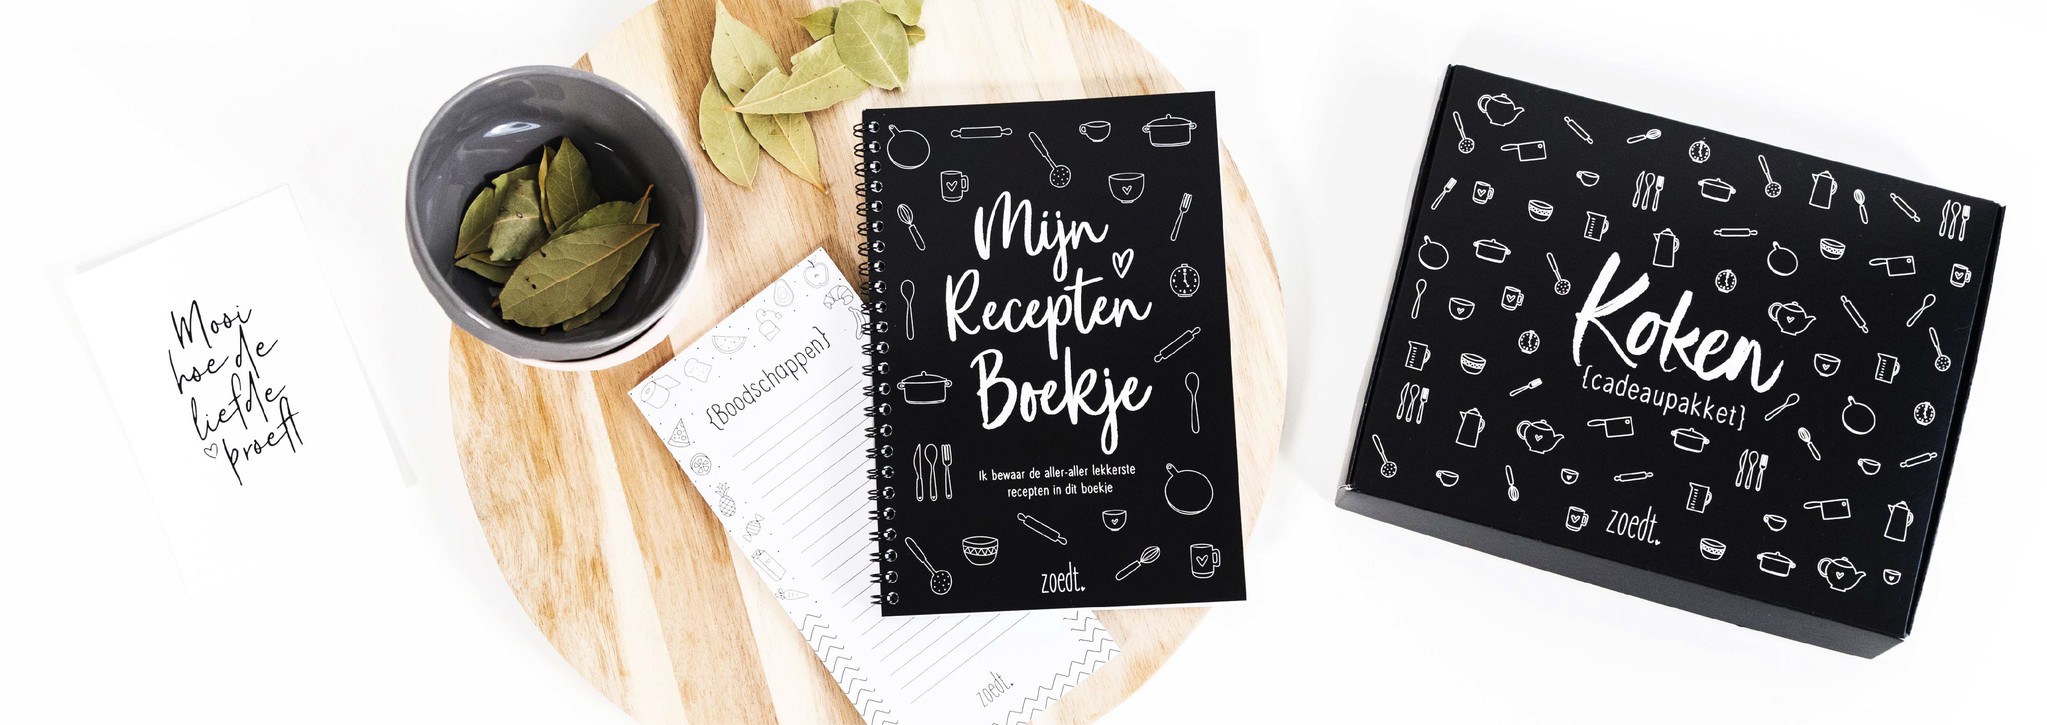 kook cadeau receptenboek cadeaupakket